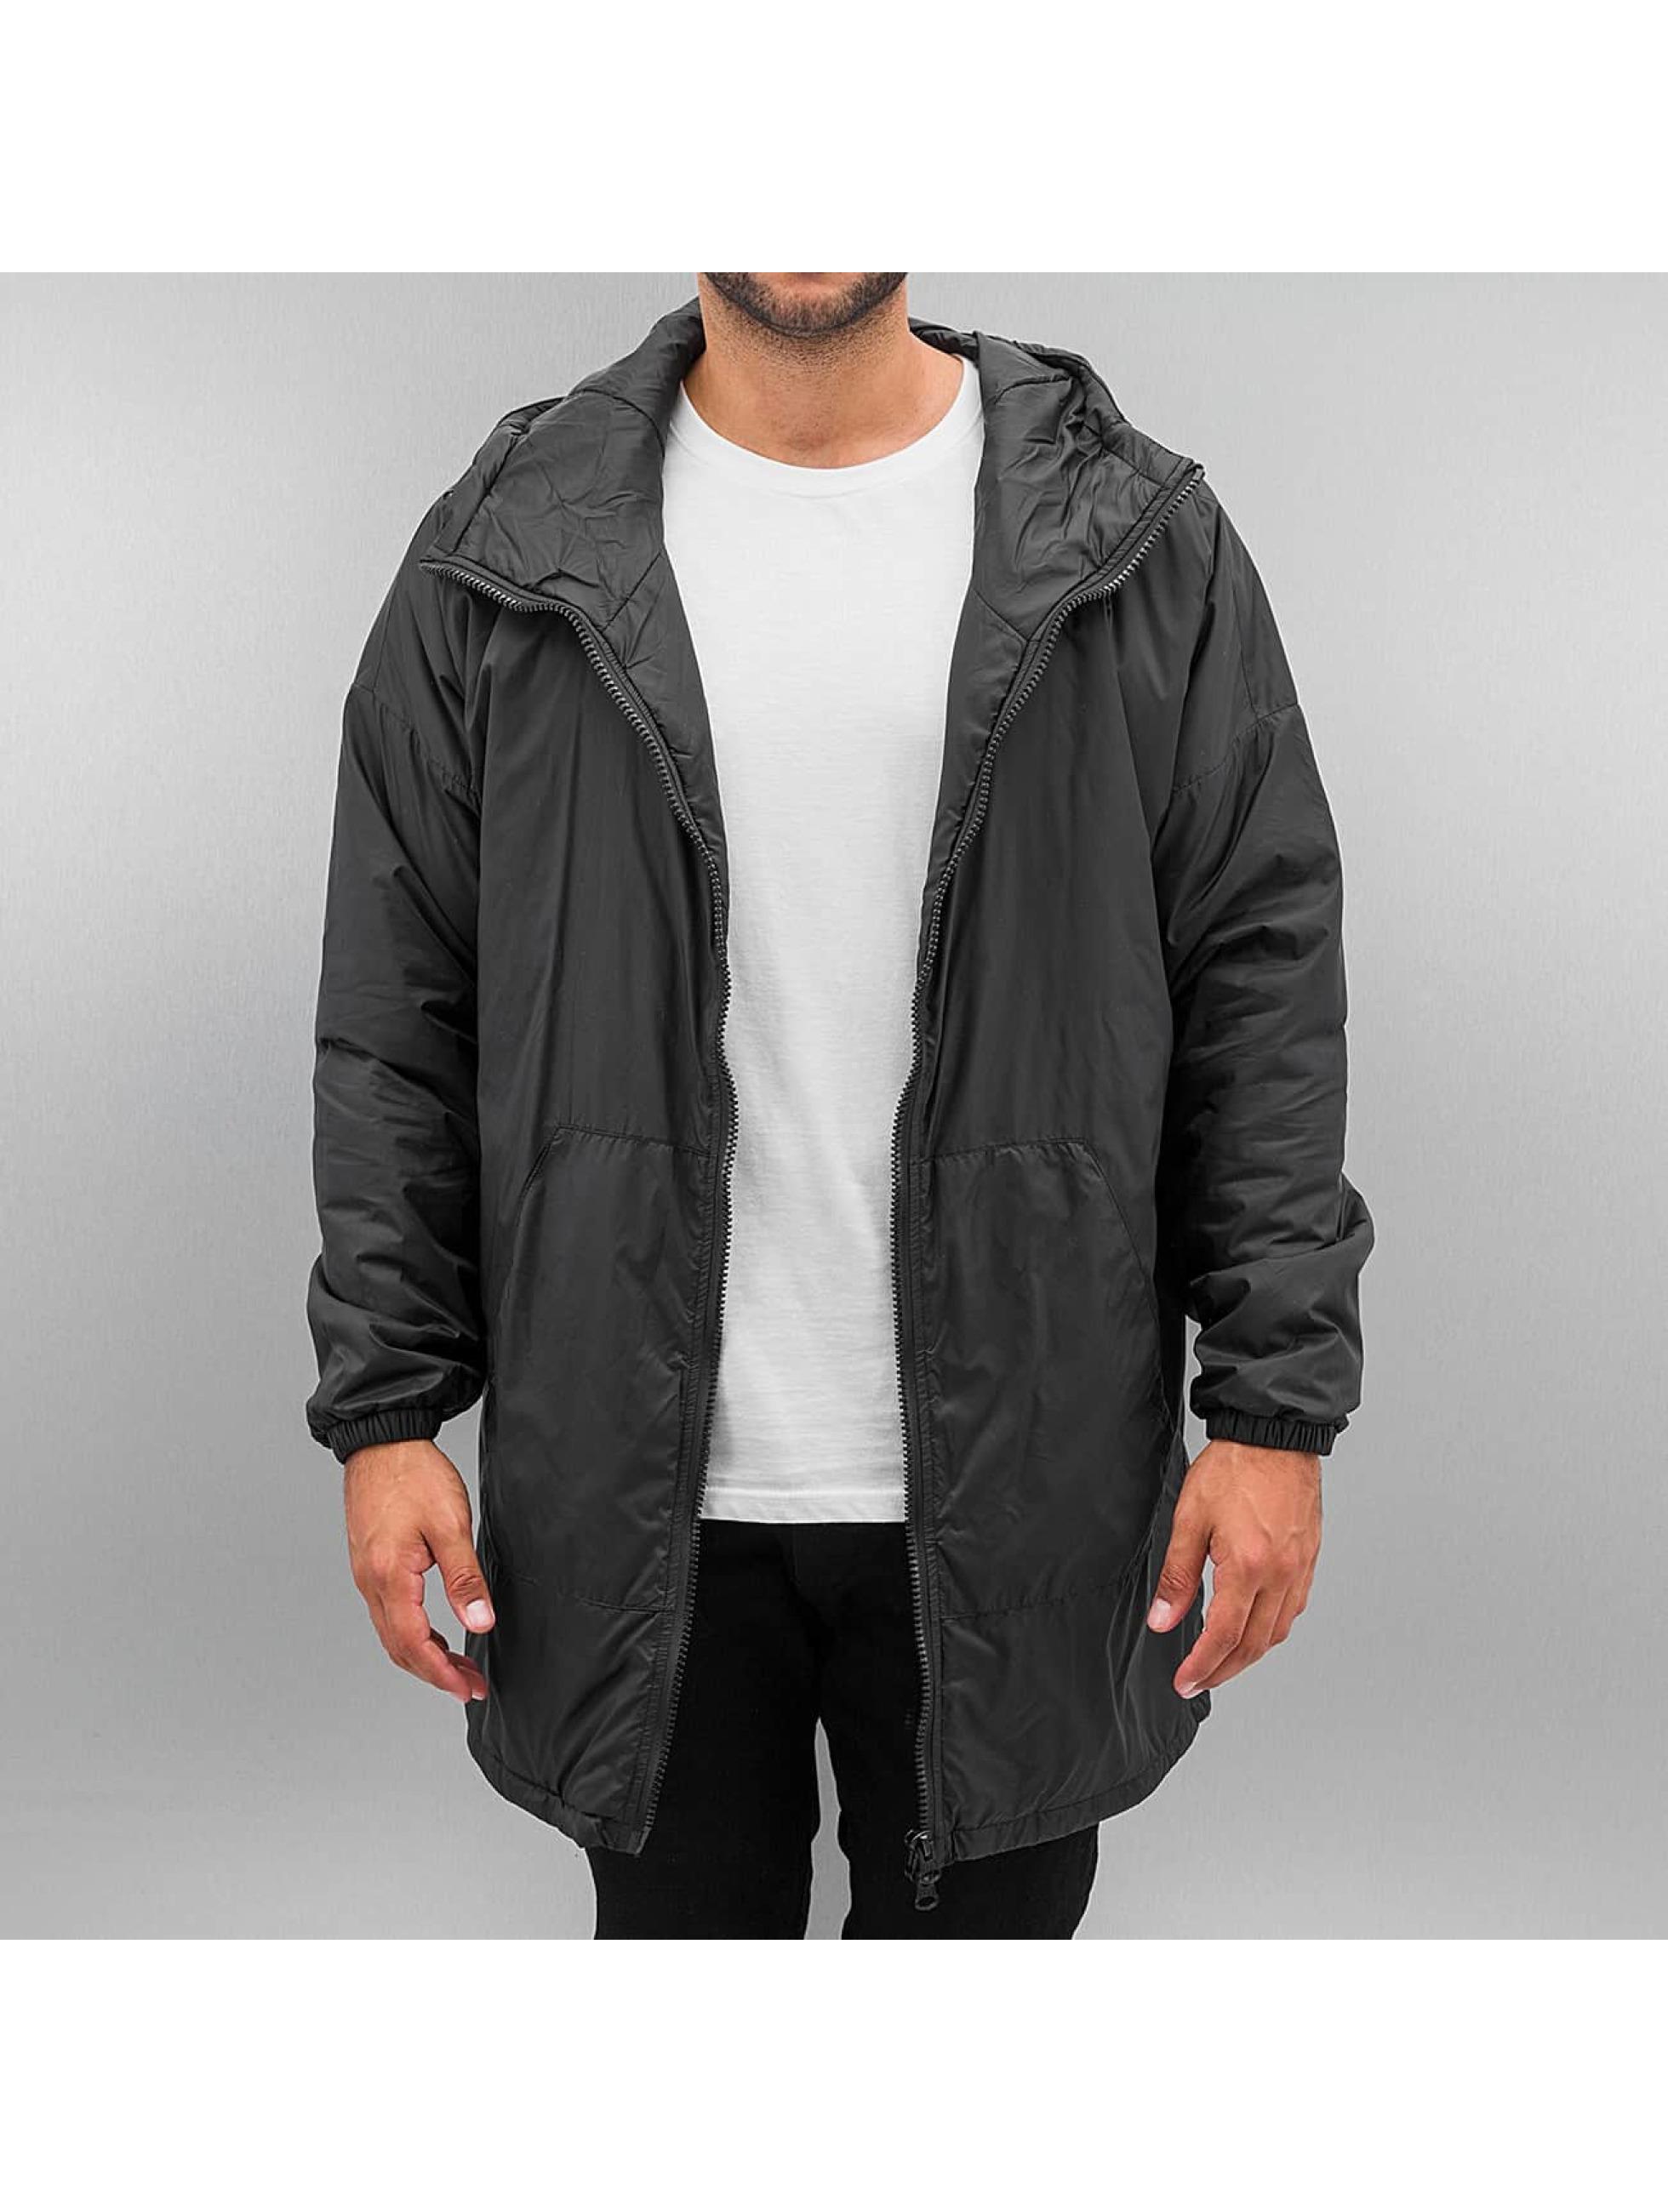 Urban Classics Lightweight Jacket Oversized black